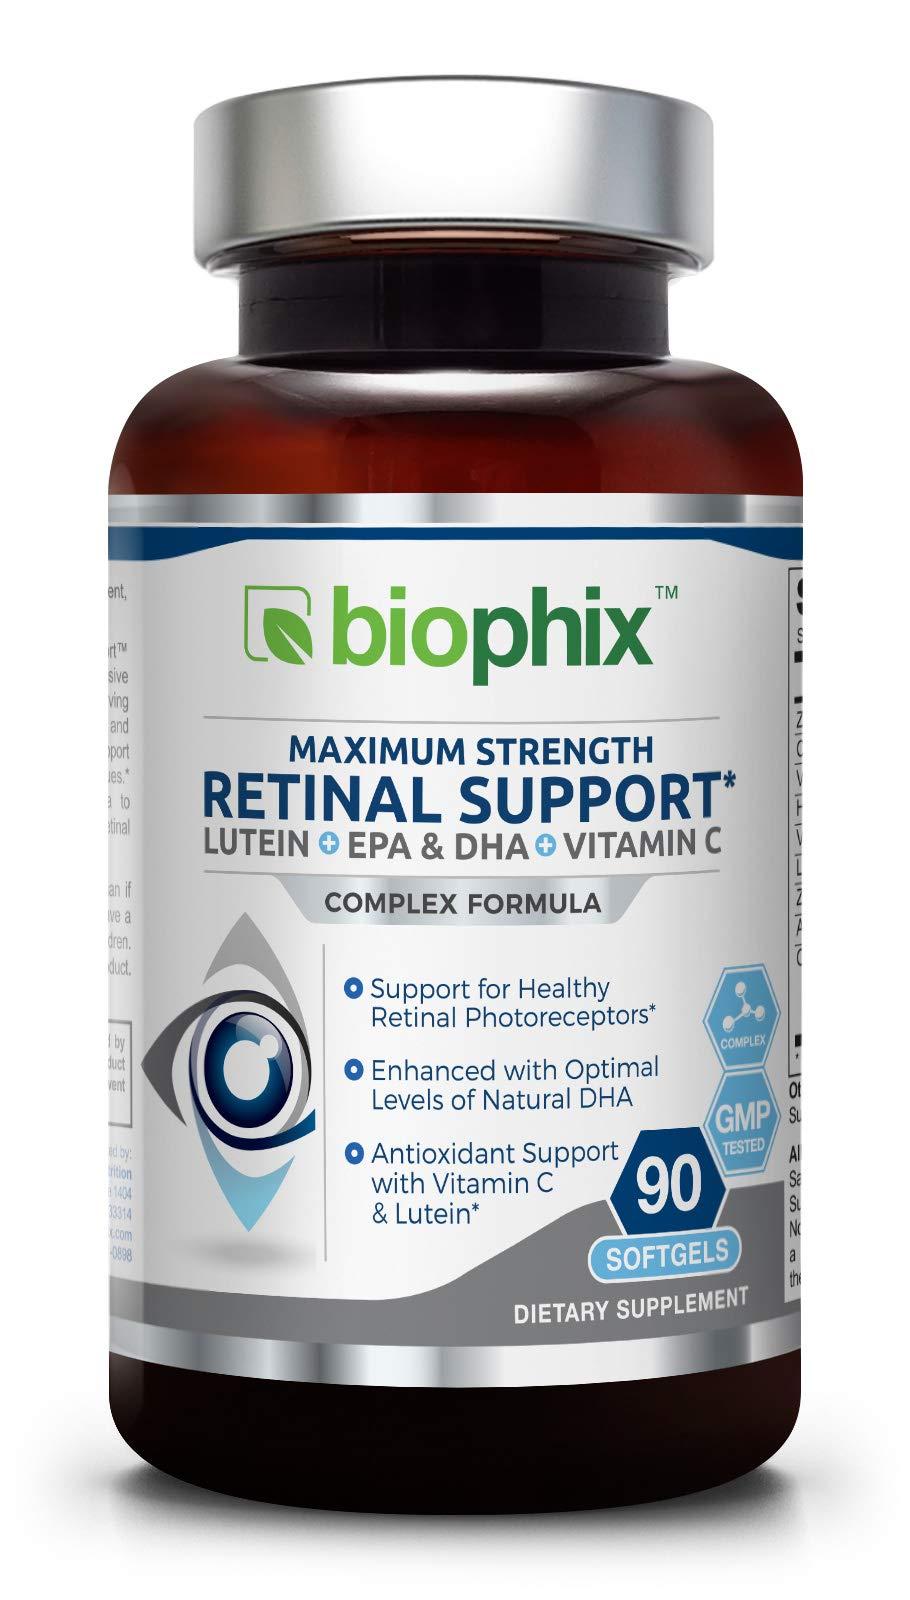 Retinal Support Maximum Strength Complex Formula 90 Softgels - Zinc | Vitamin C E | Omega-3 EPA DHA | Lutein | Astaxanthin | Hyaluronic Acid | Eye Healthy Vision Support